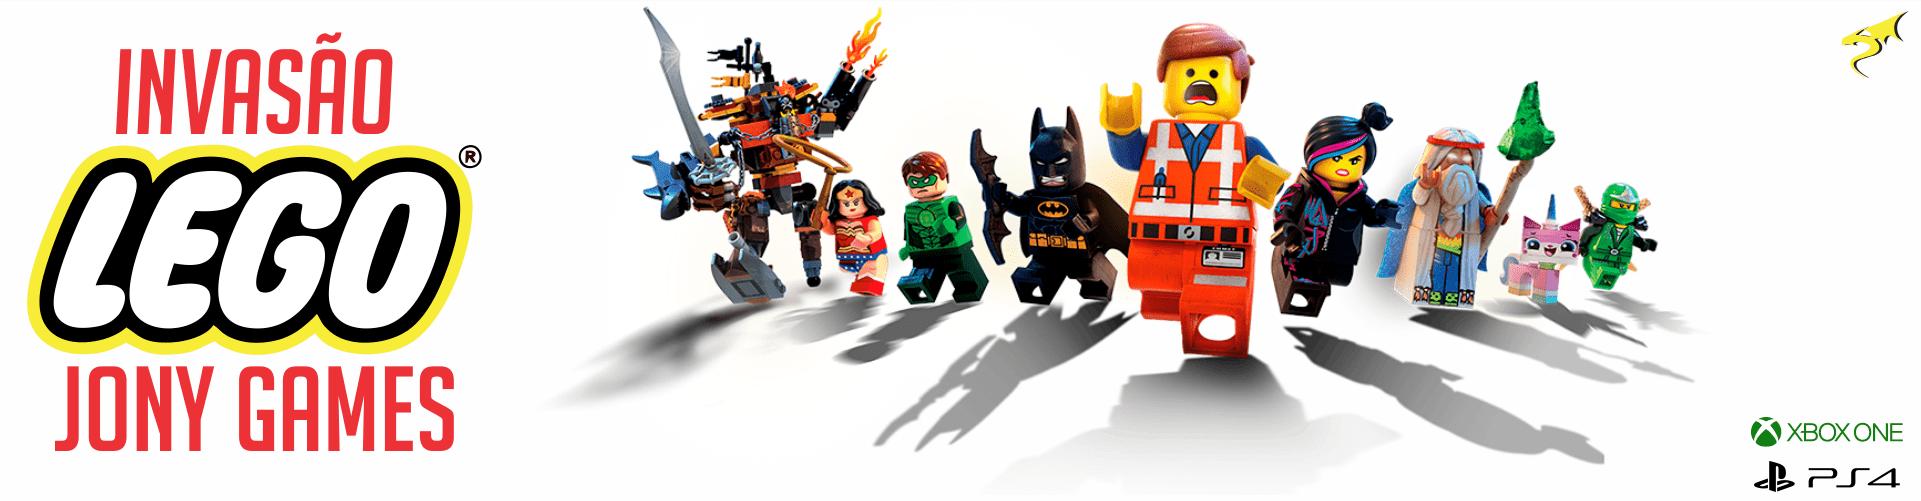 Invasão Lego